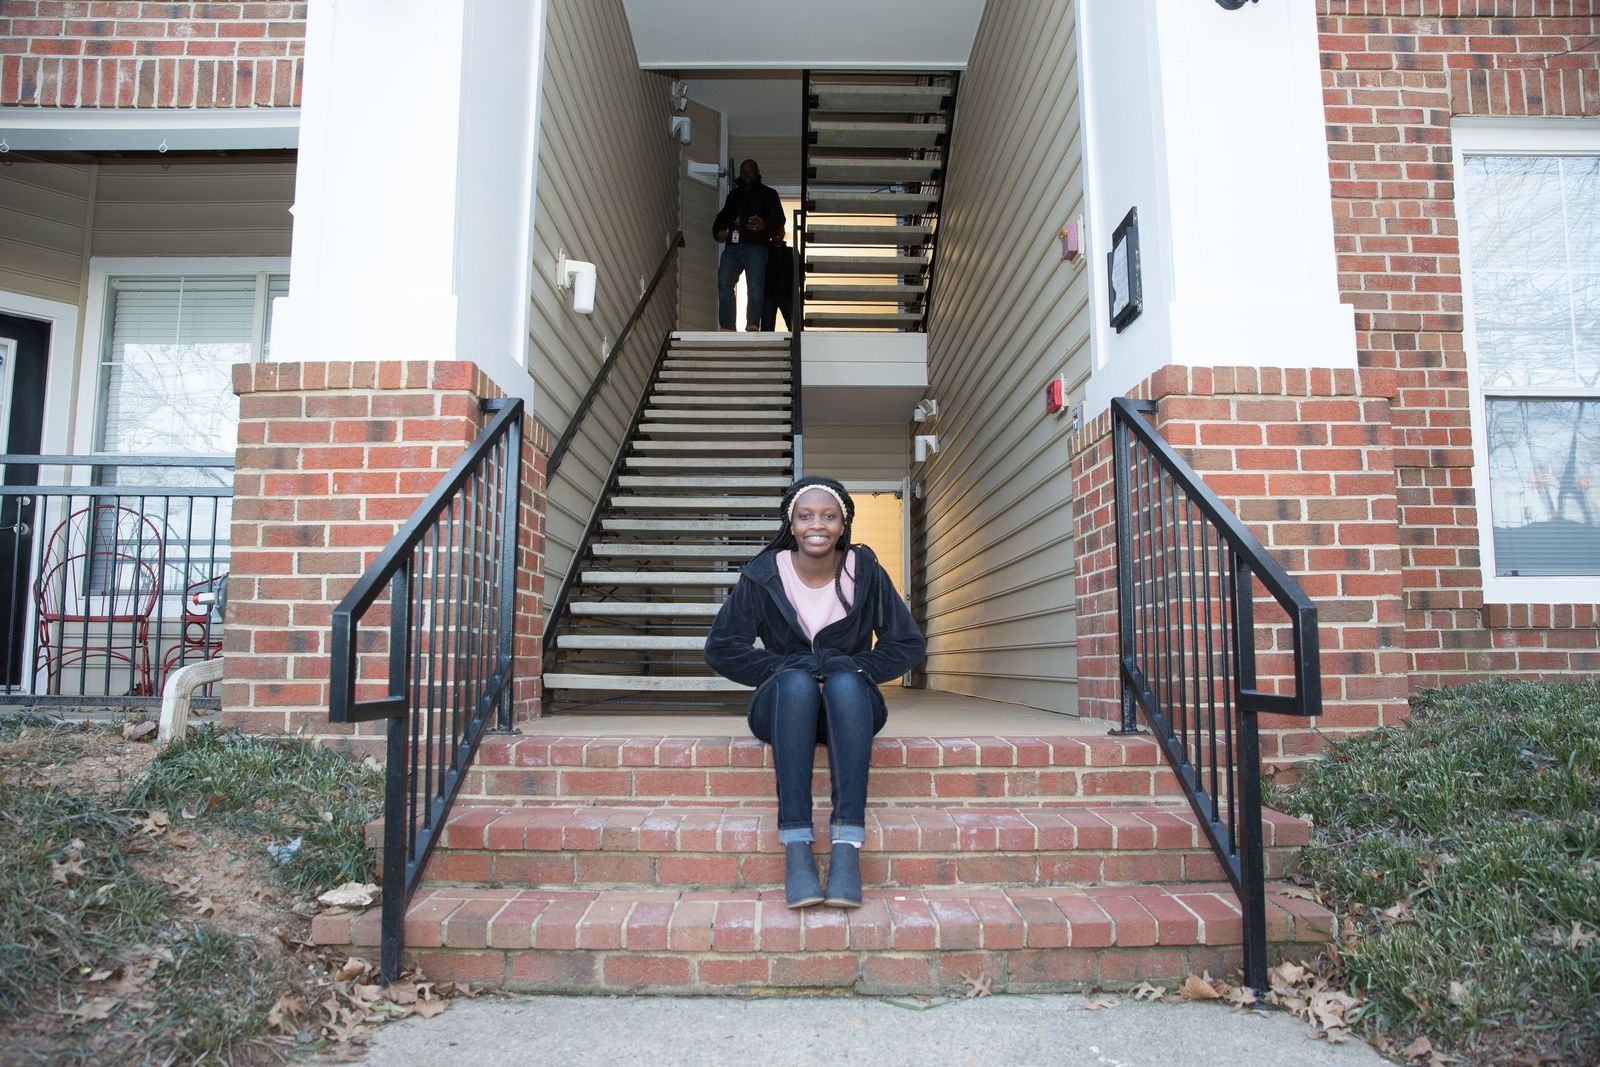 dpa-Story - Teenager und Amokläufe in den USA